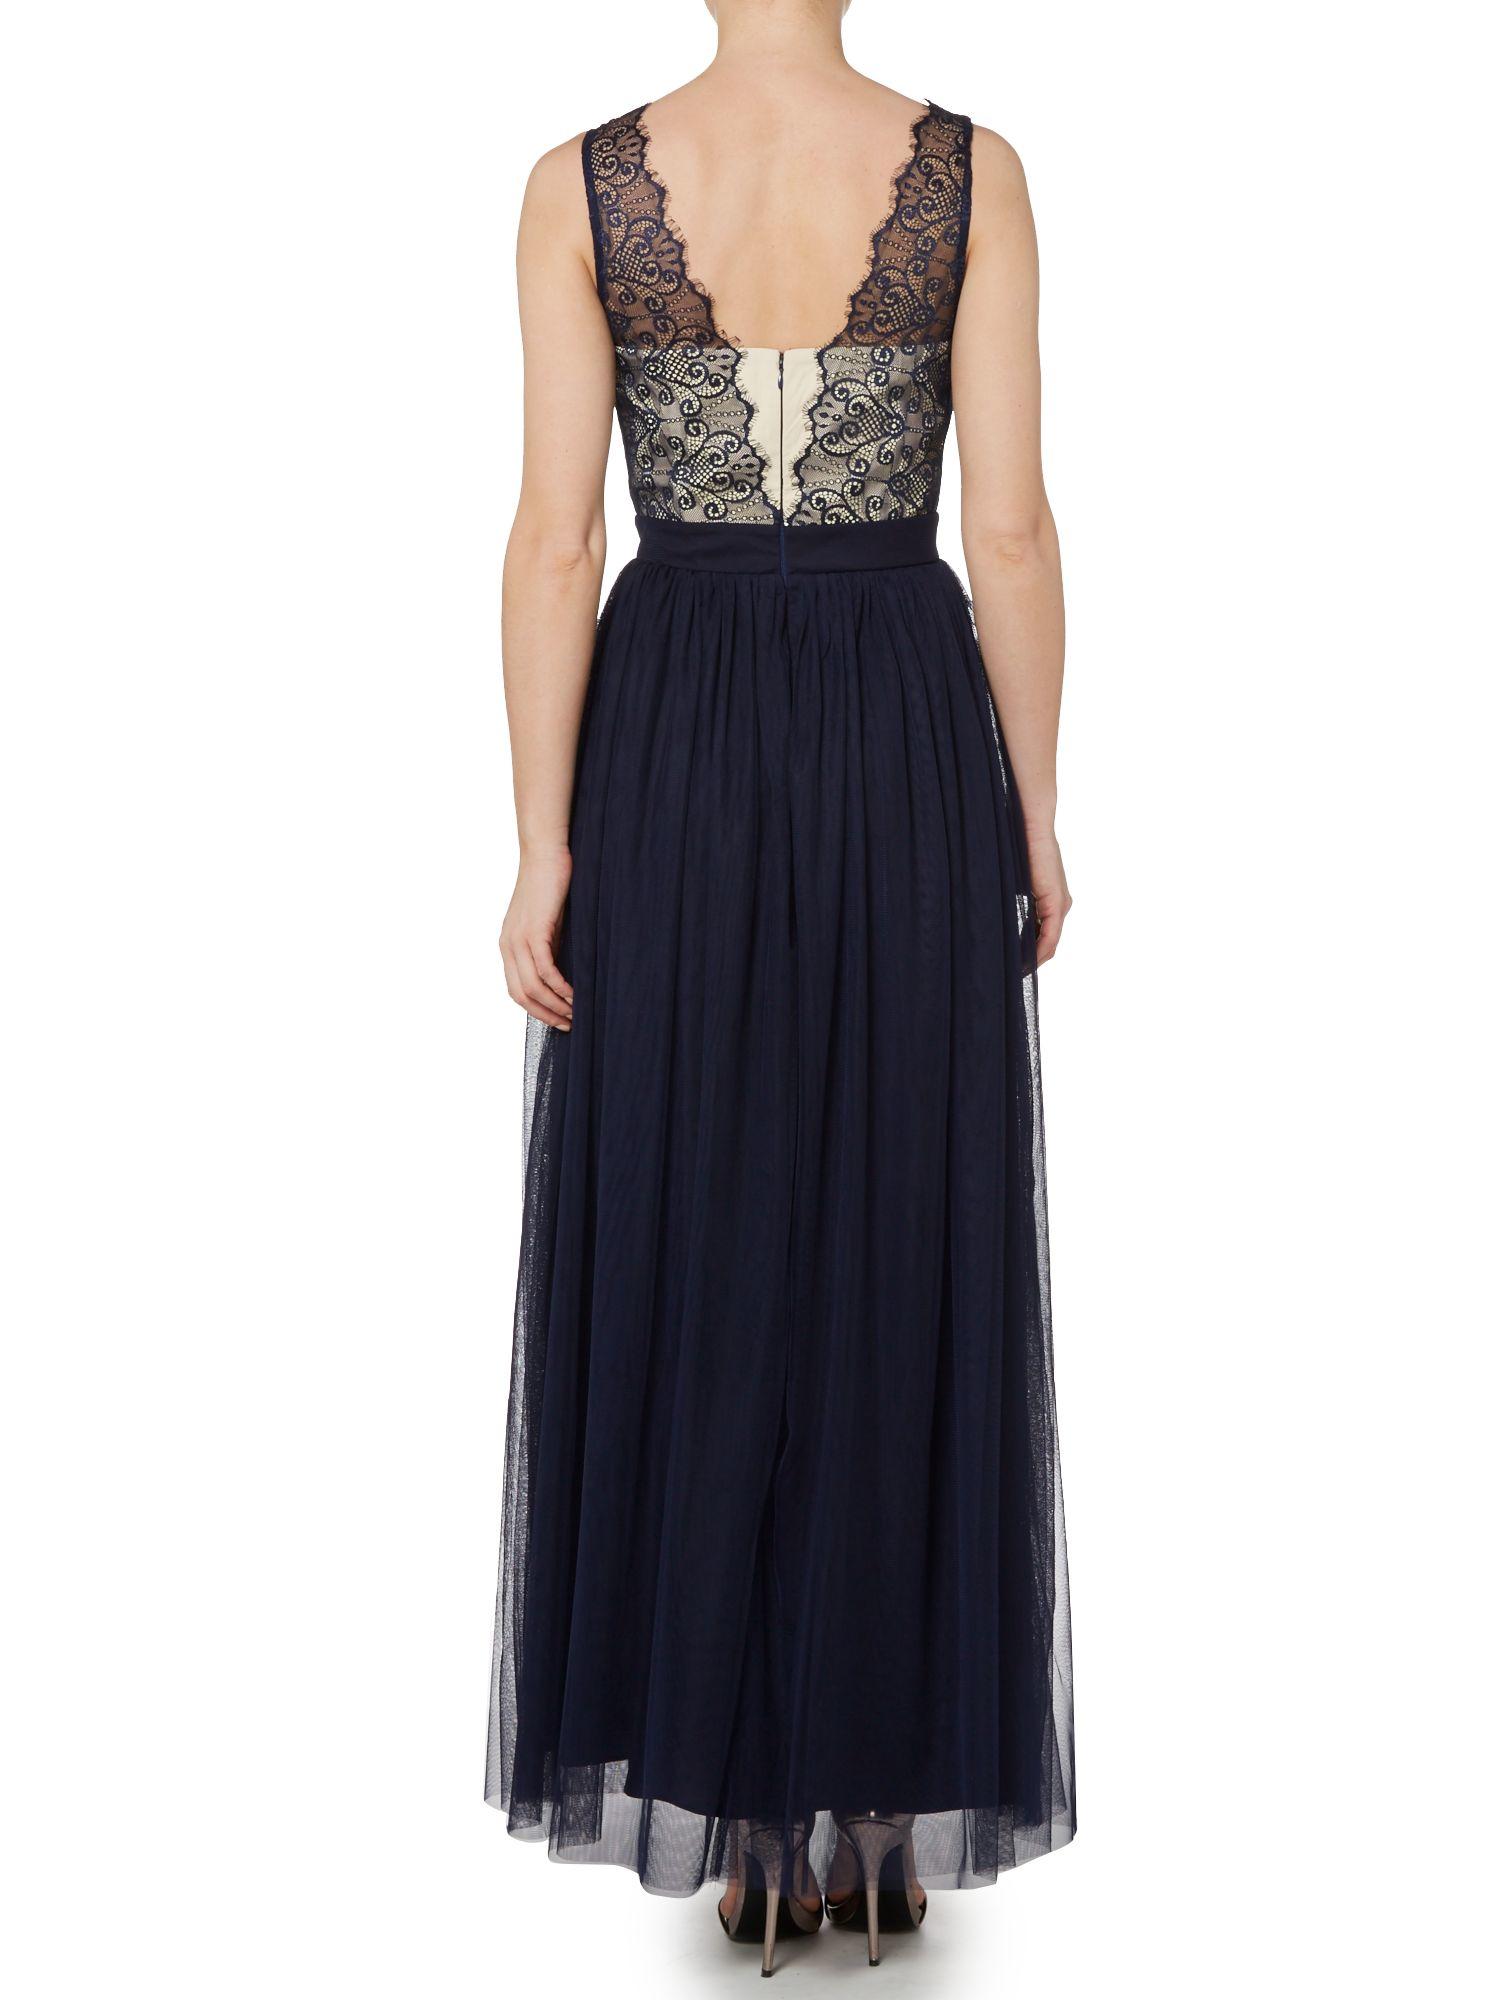 Little Mistress Plunge Neckline Maxi Dress With Lace Top